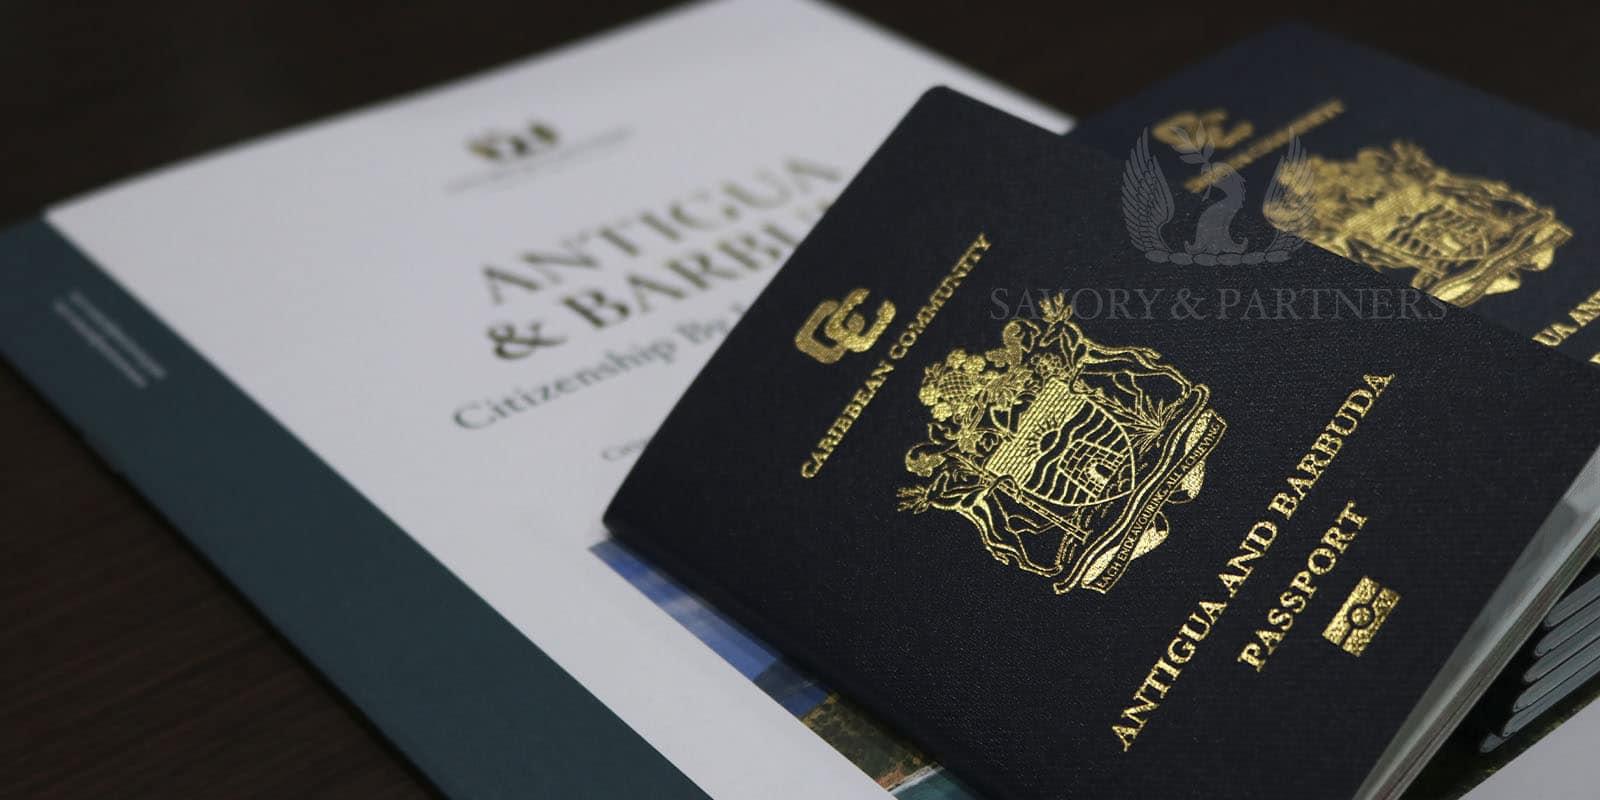 Antigua & Barbuda citizenship by investment program